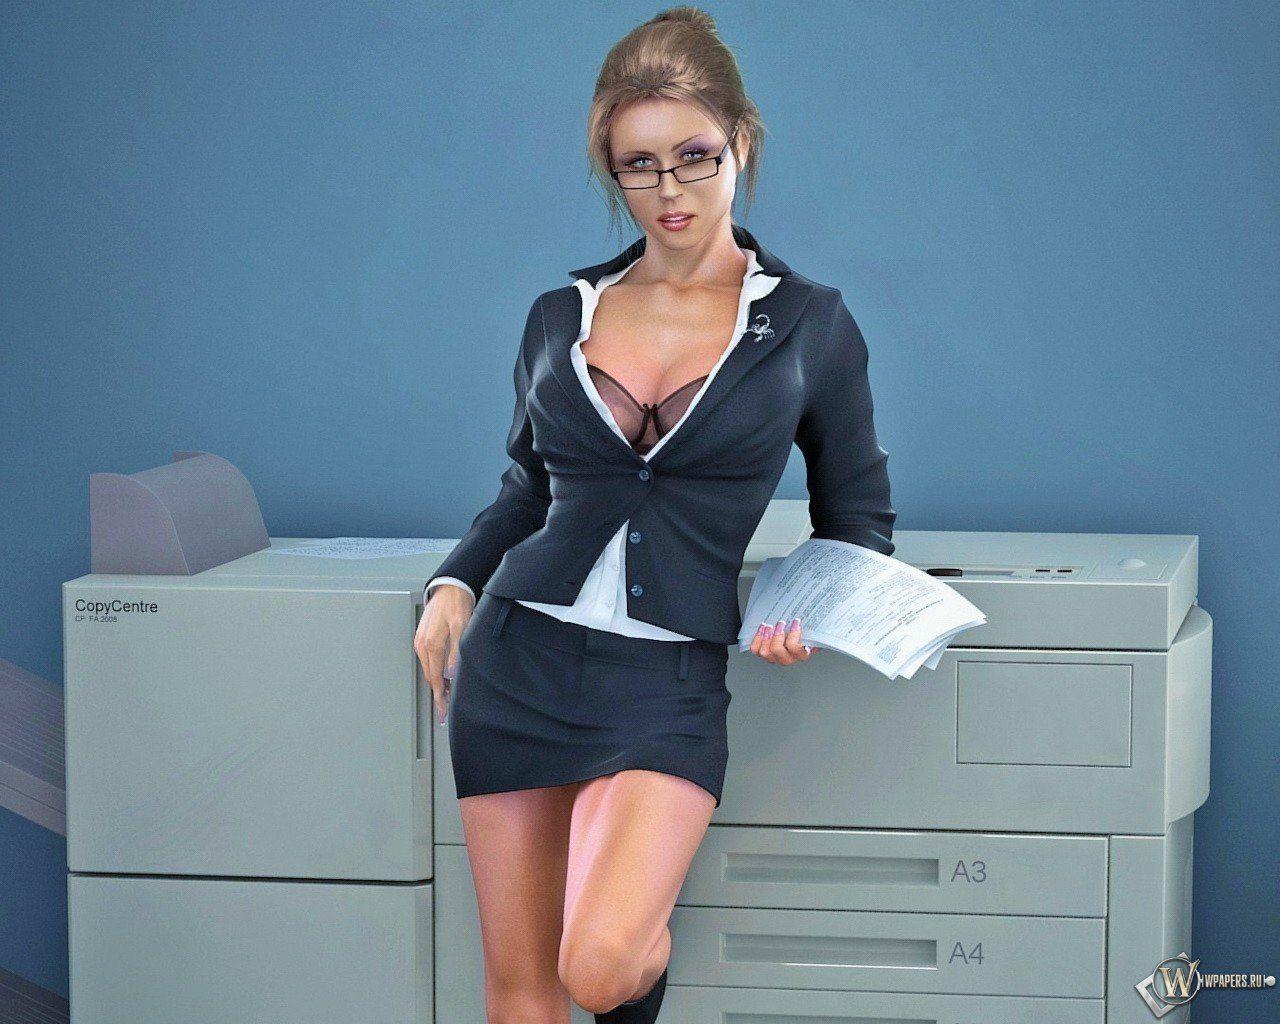 Free Sexy Secretary Pics seductive   3d seductive secretary free pictures on your